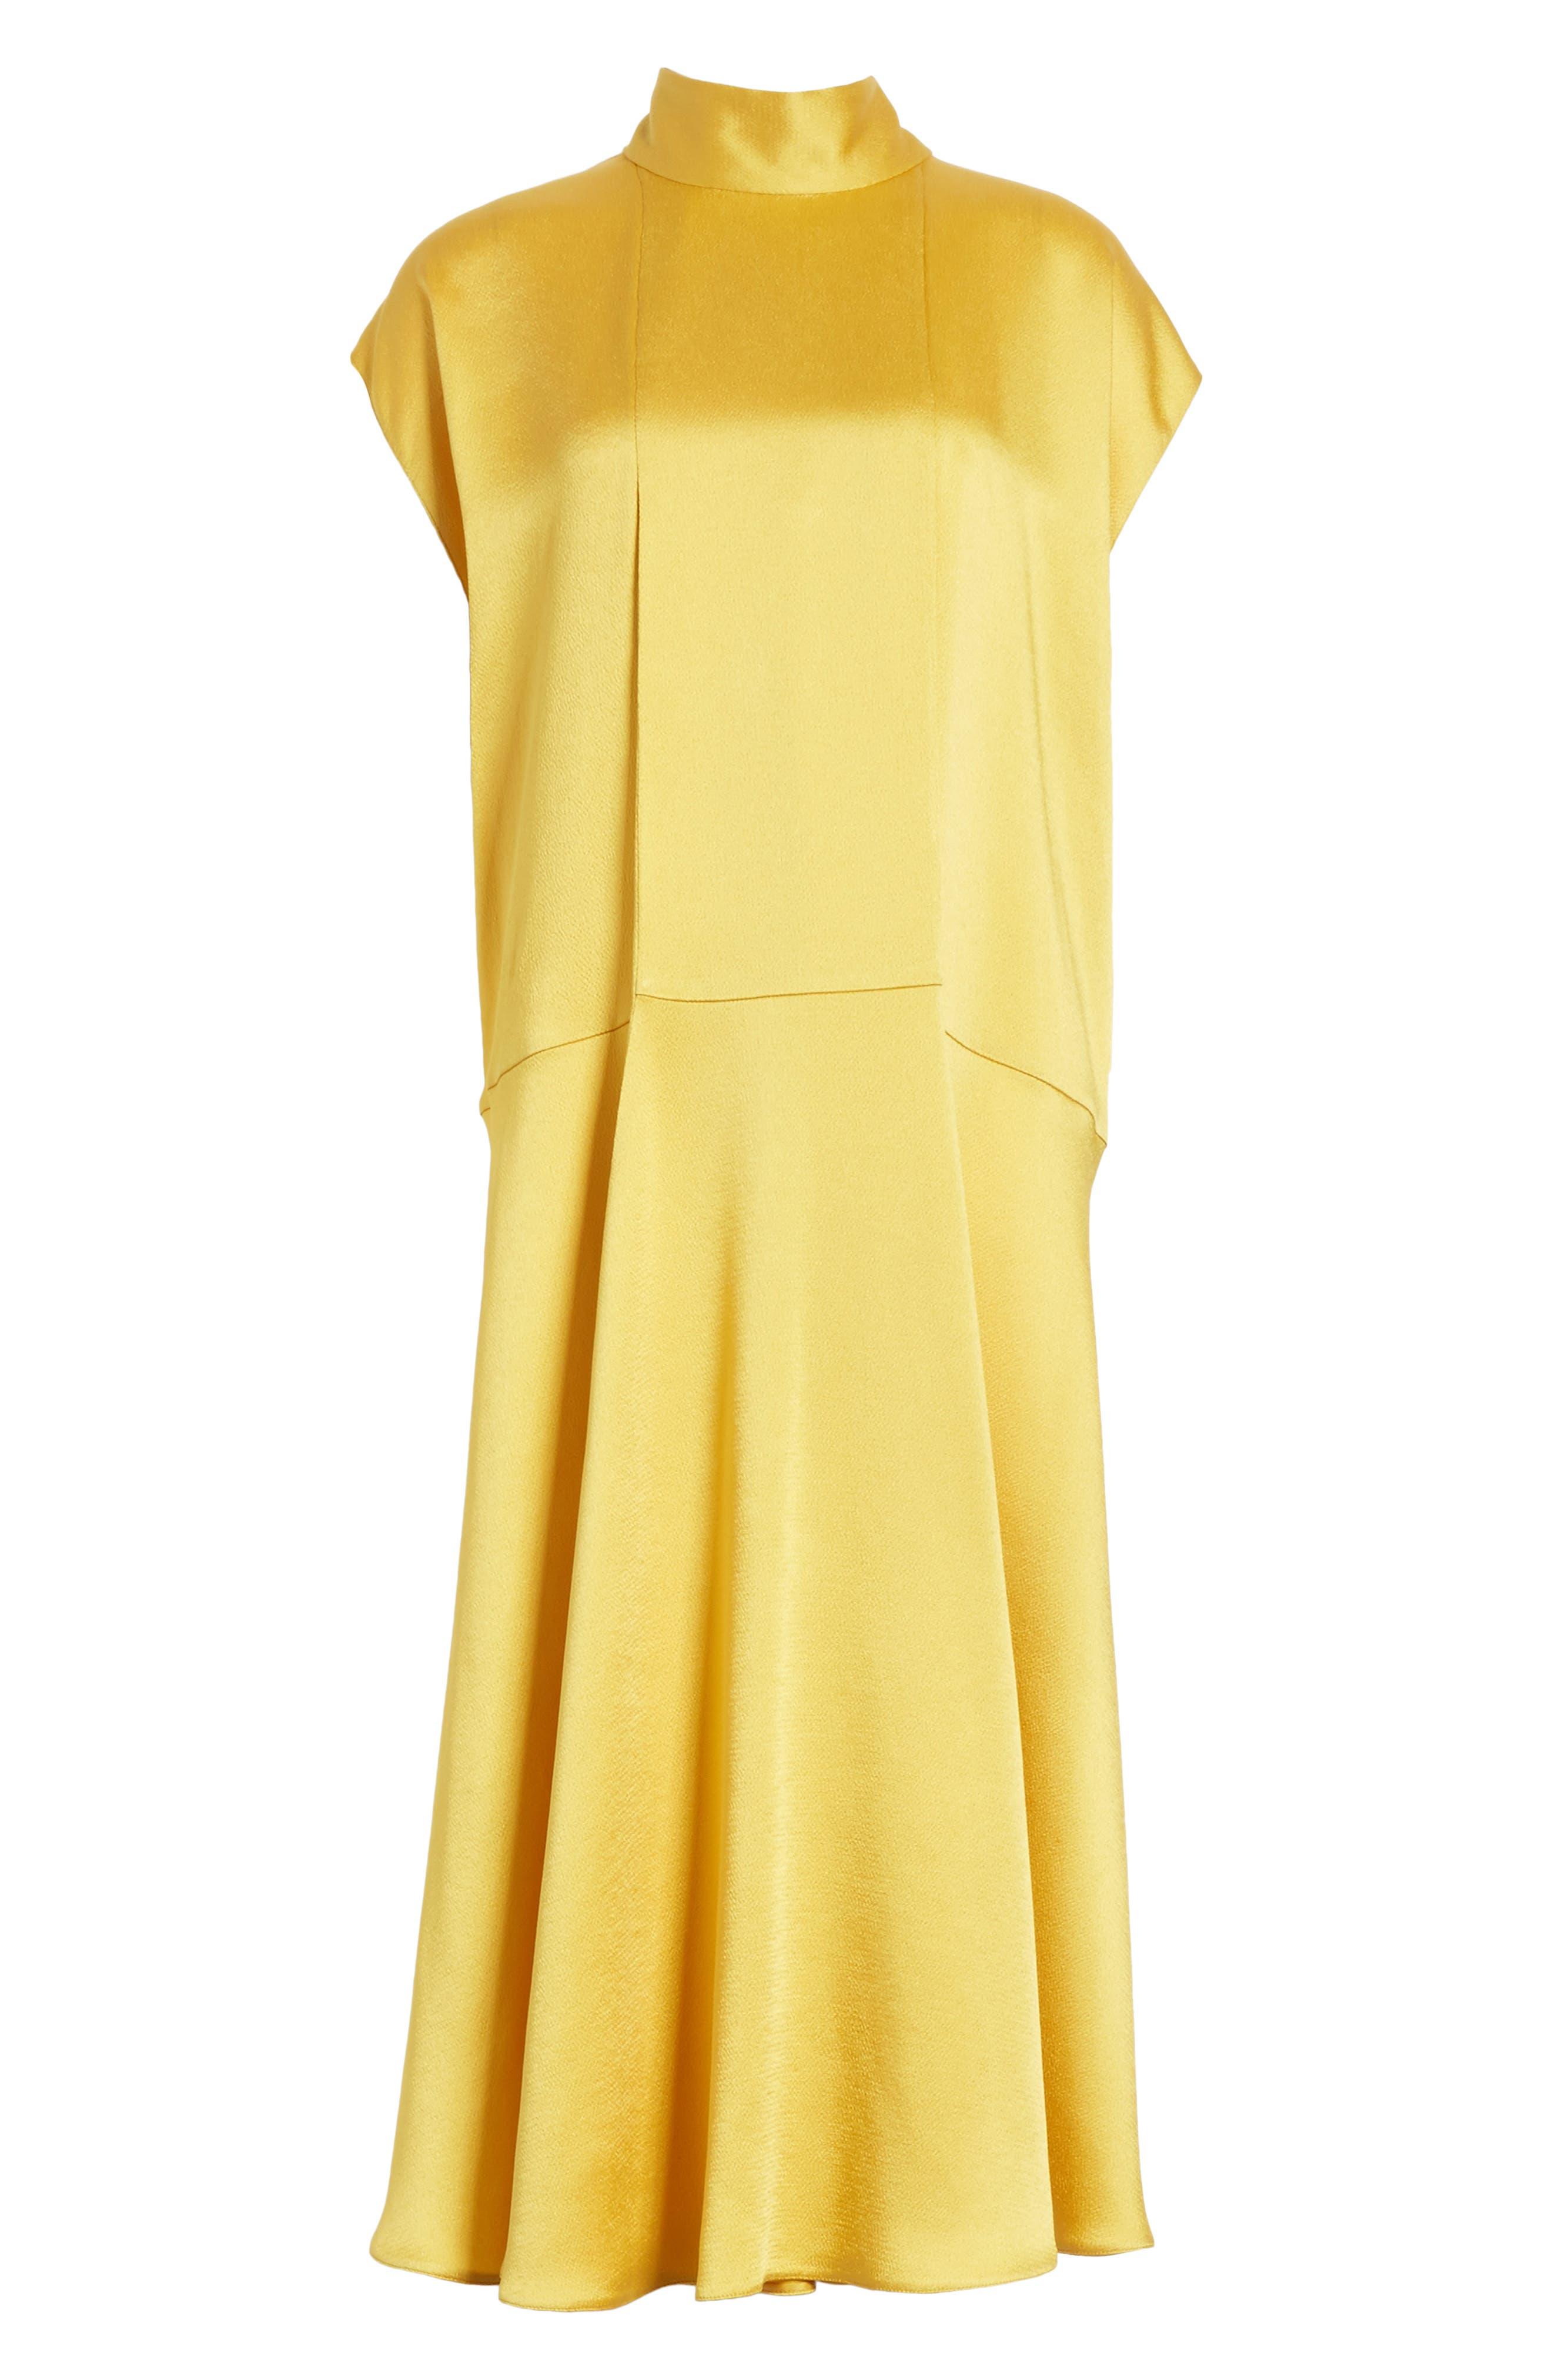 Hammered Satin Midi Dress,                             Alternate thumbnail 6, color,